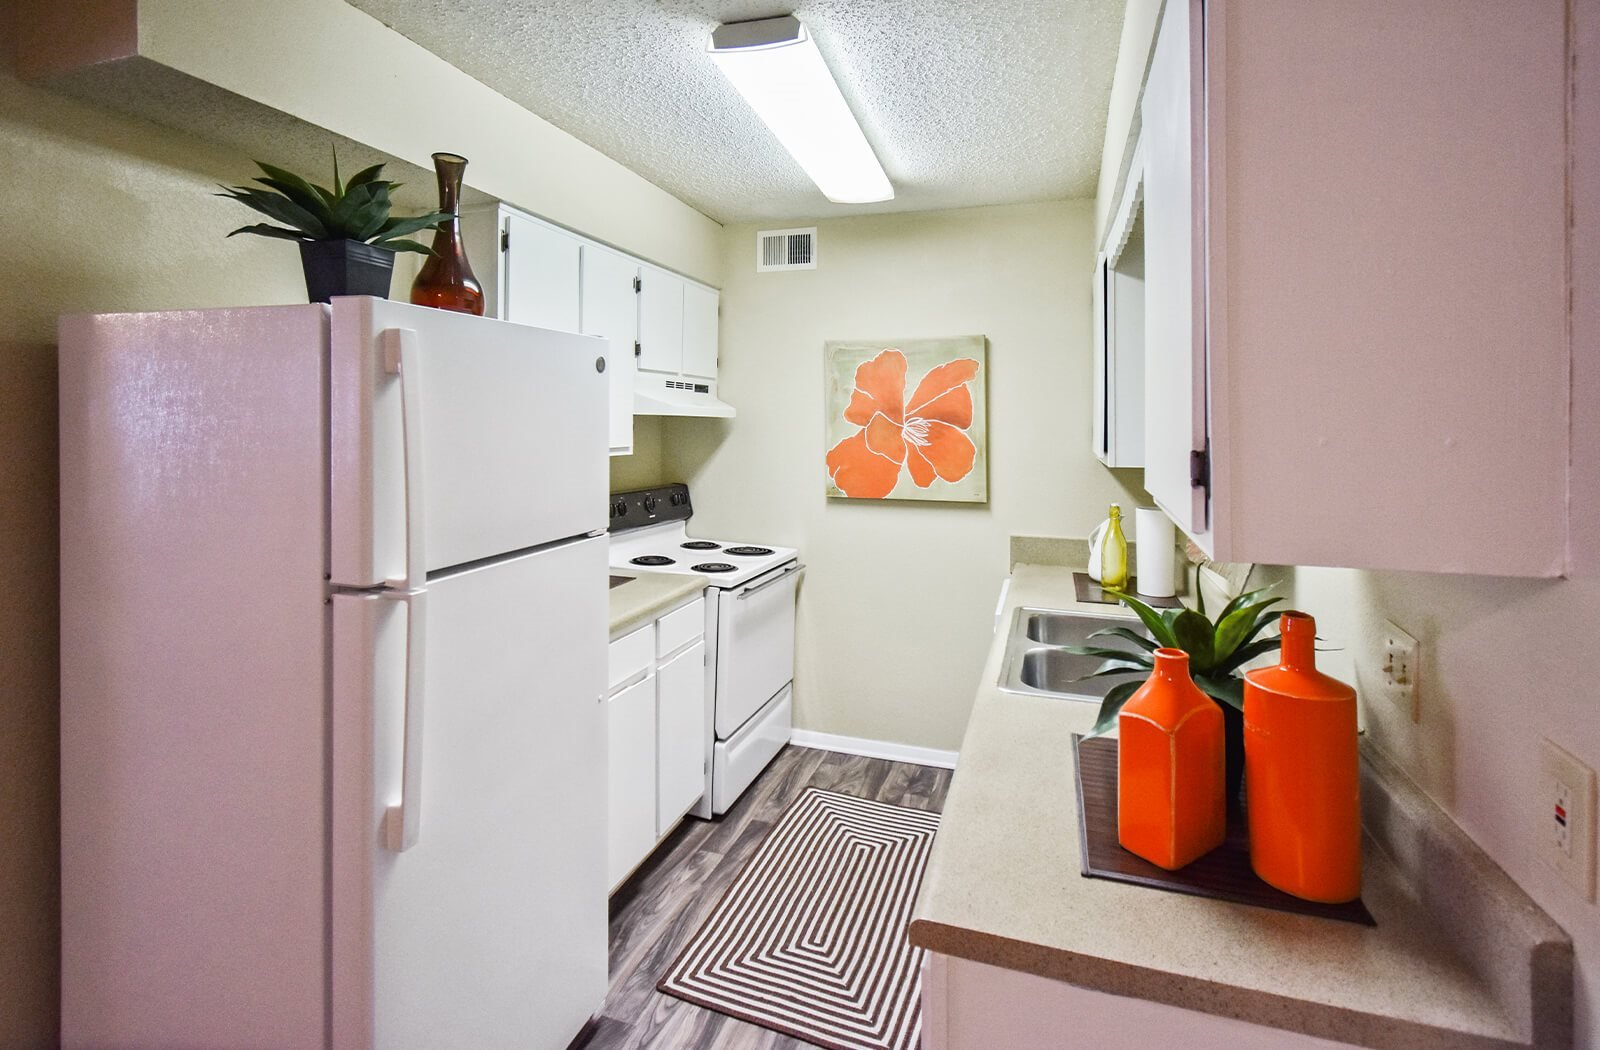 The Berkley Apartments kitchen